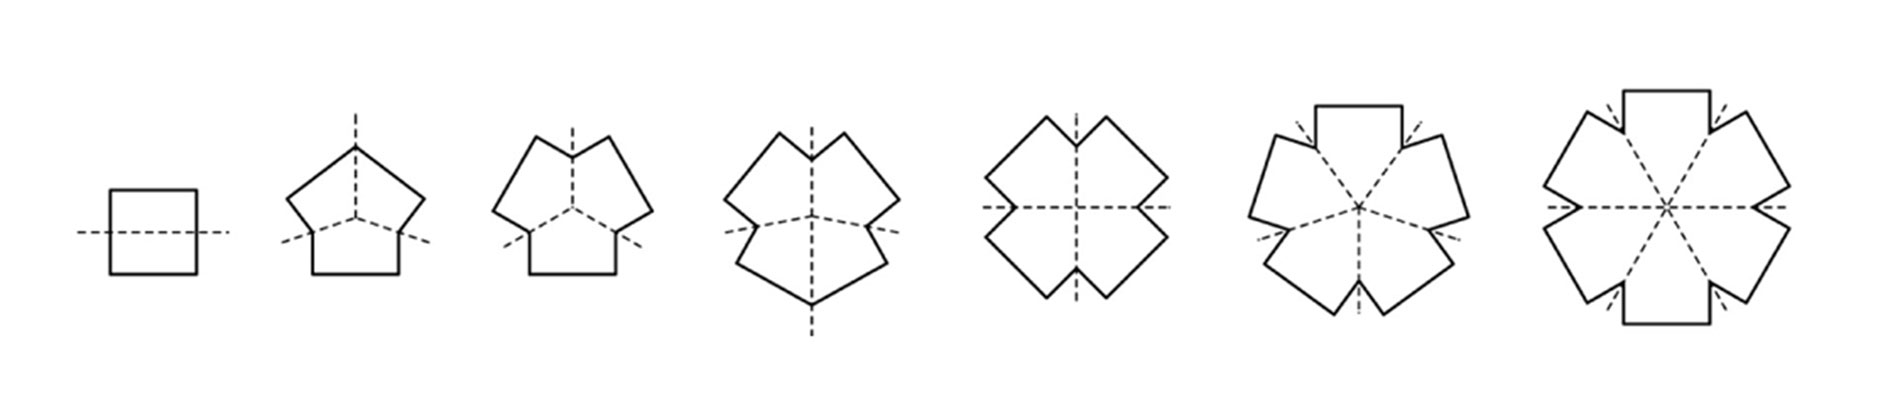 badtölz concept drawing